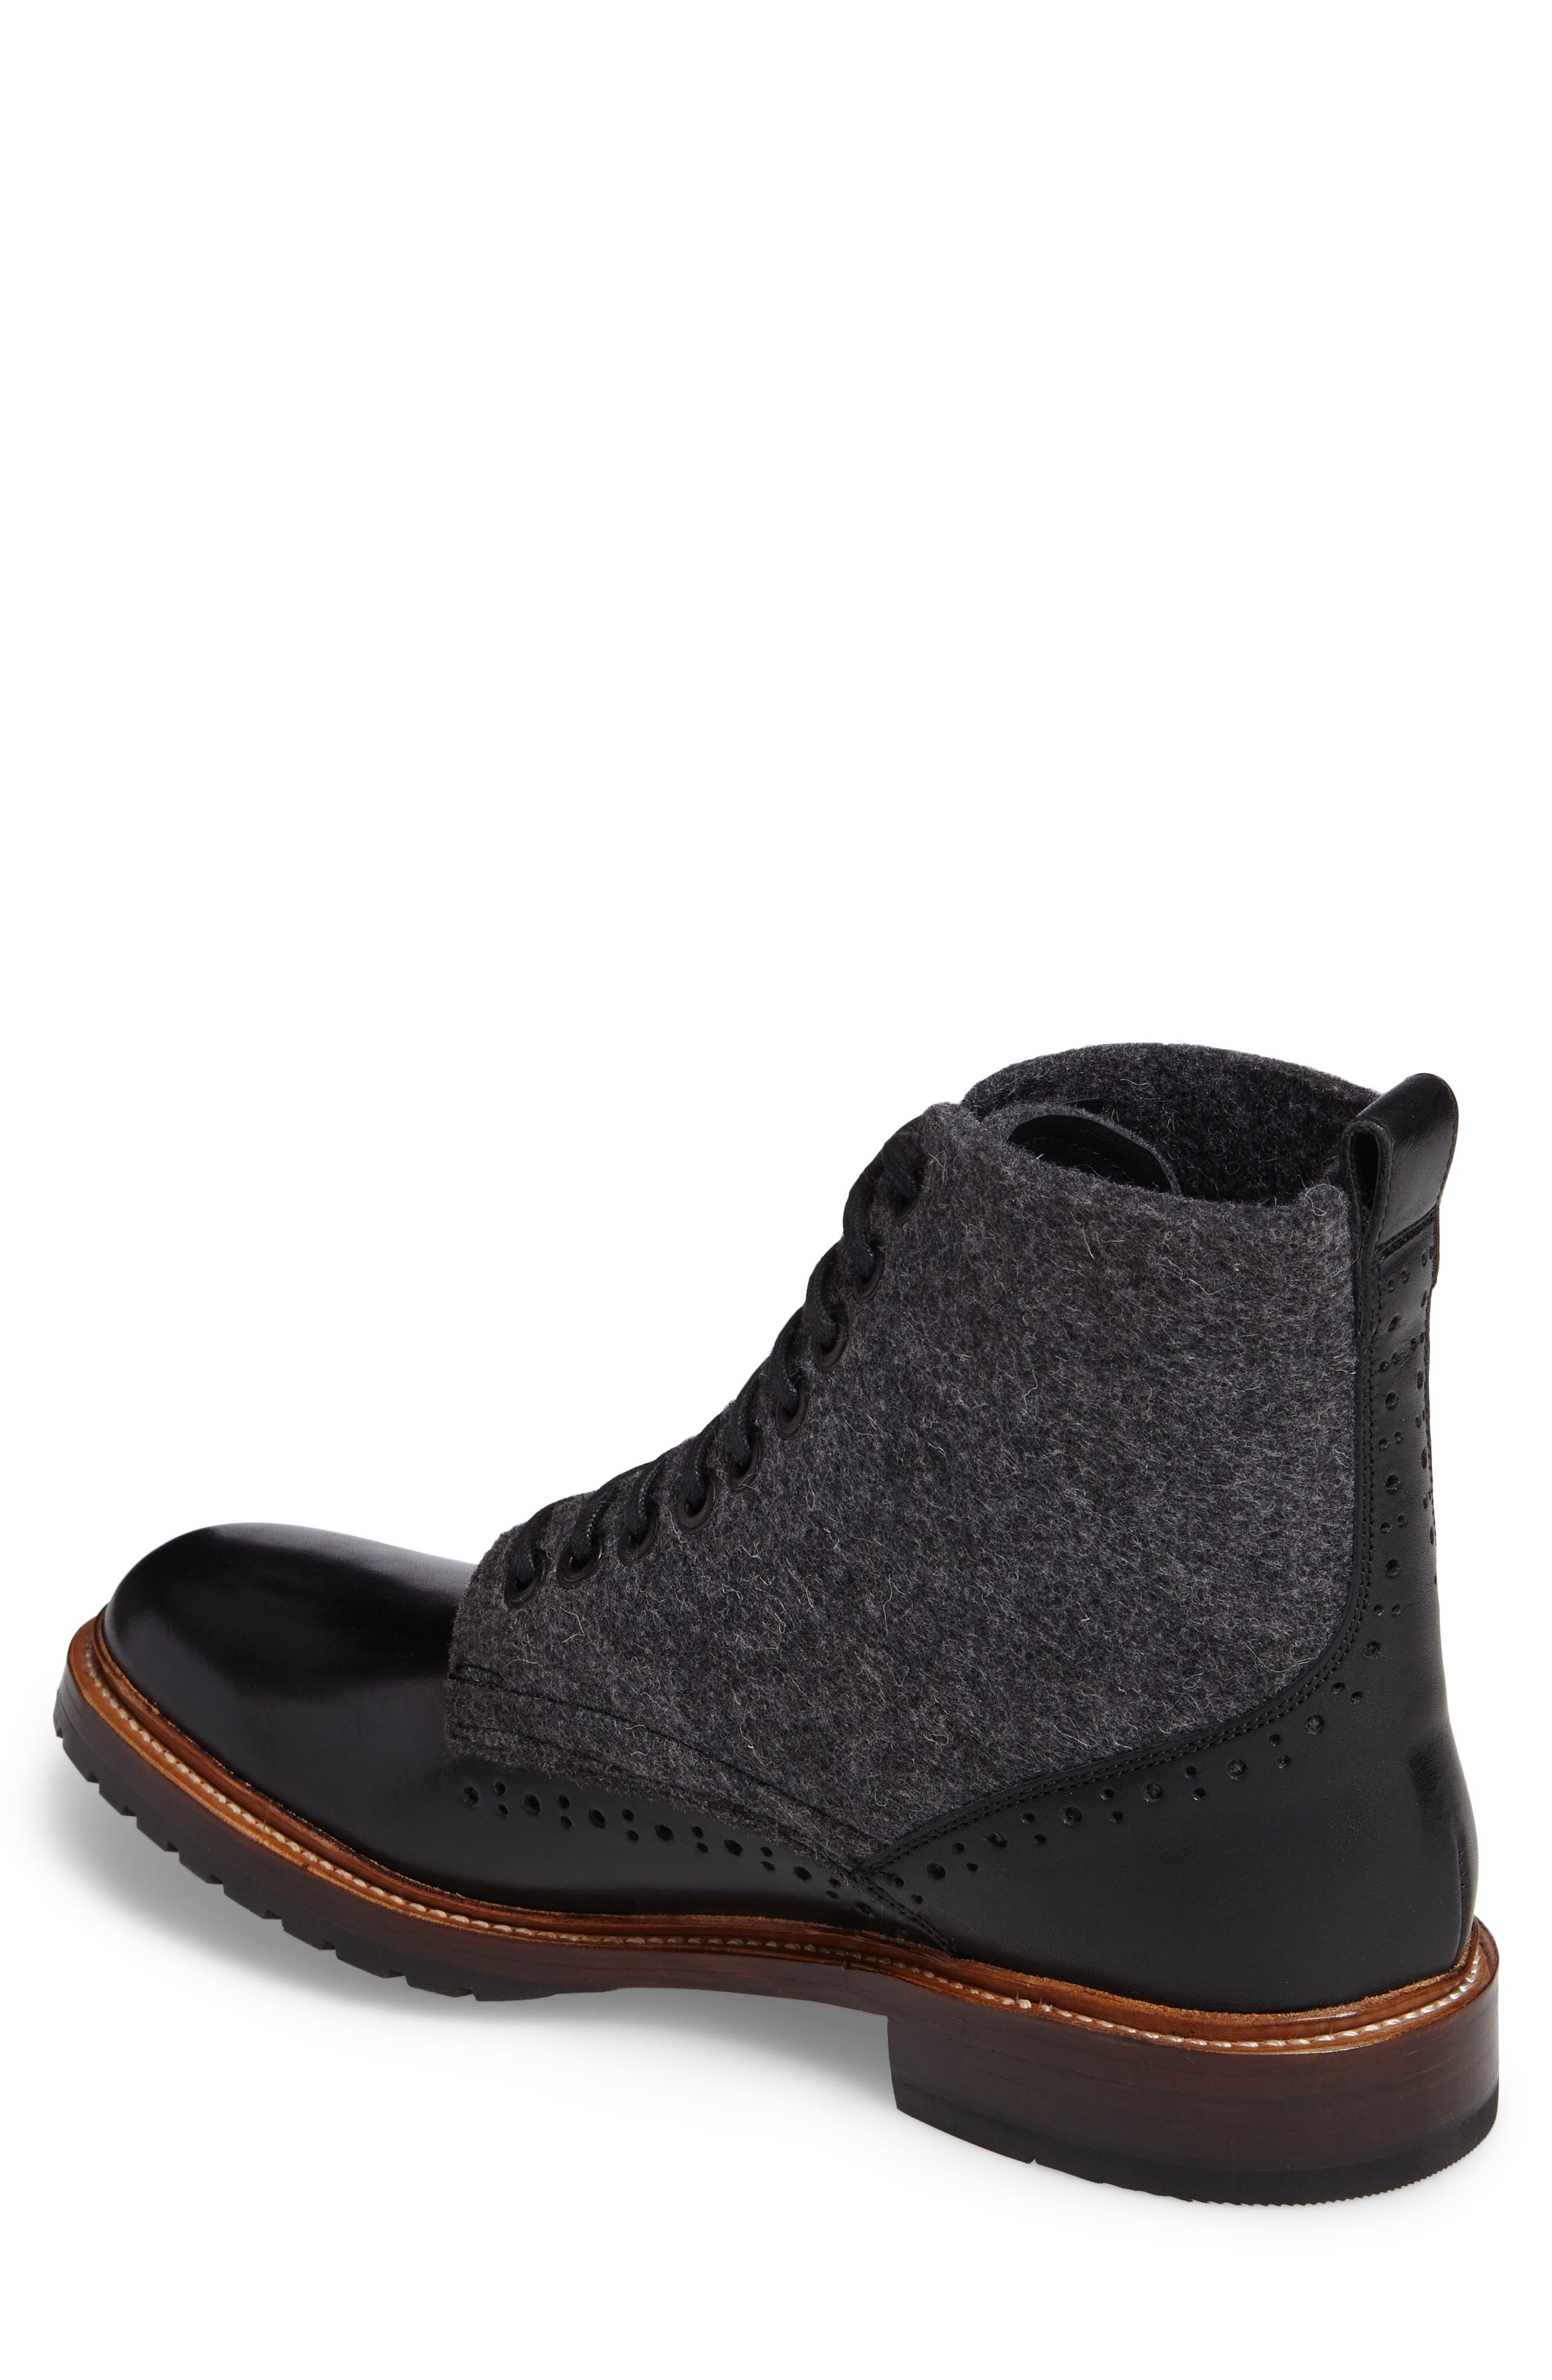 Madison II Felt Shaft Boot,                             Alternate thumbnail 2, color,                             Black